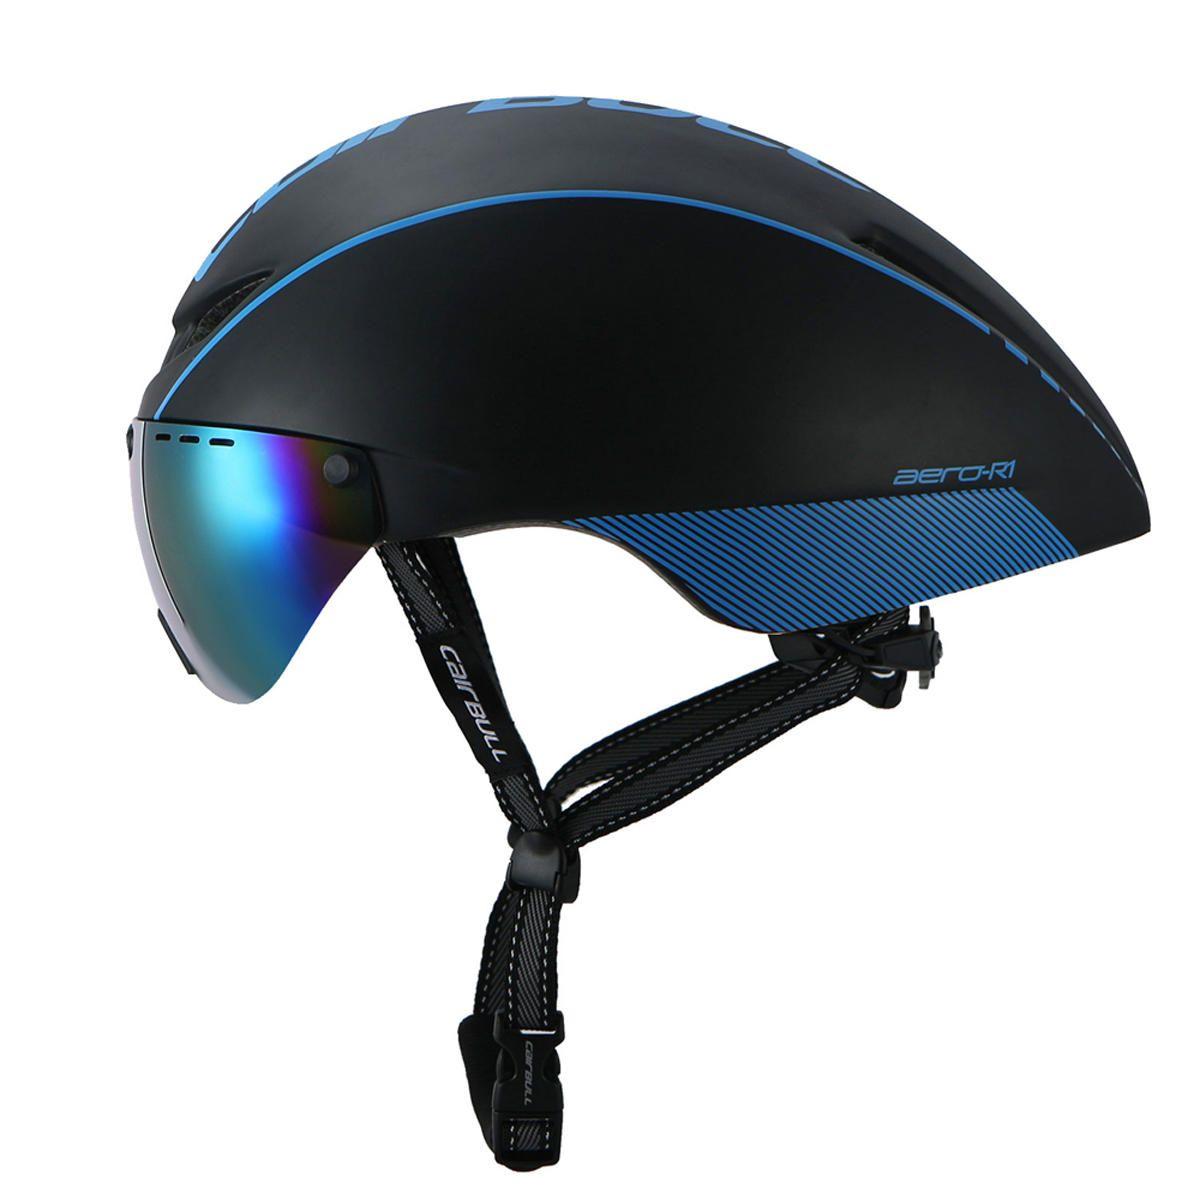 Cairbull Aero R1 Road Cycling Bike Helmet Racing Bicycle Safety